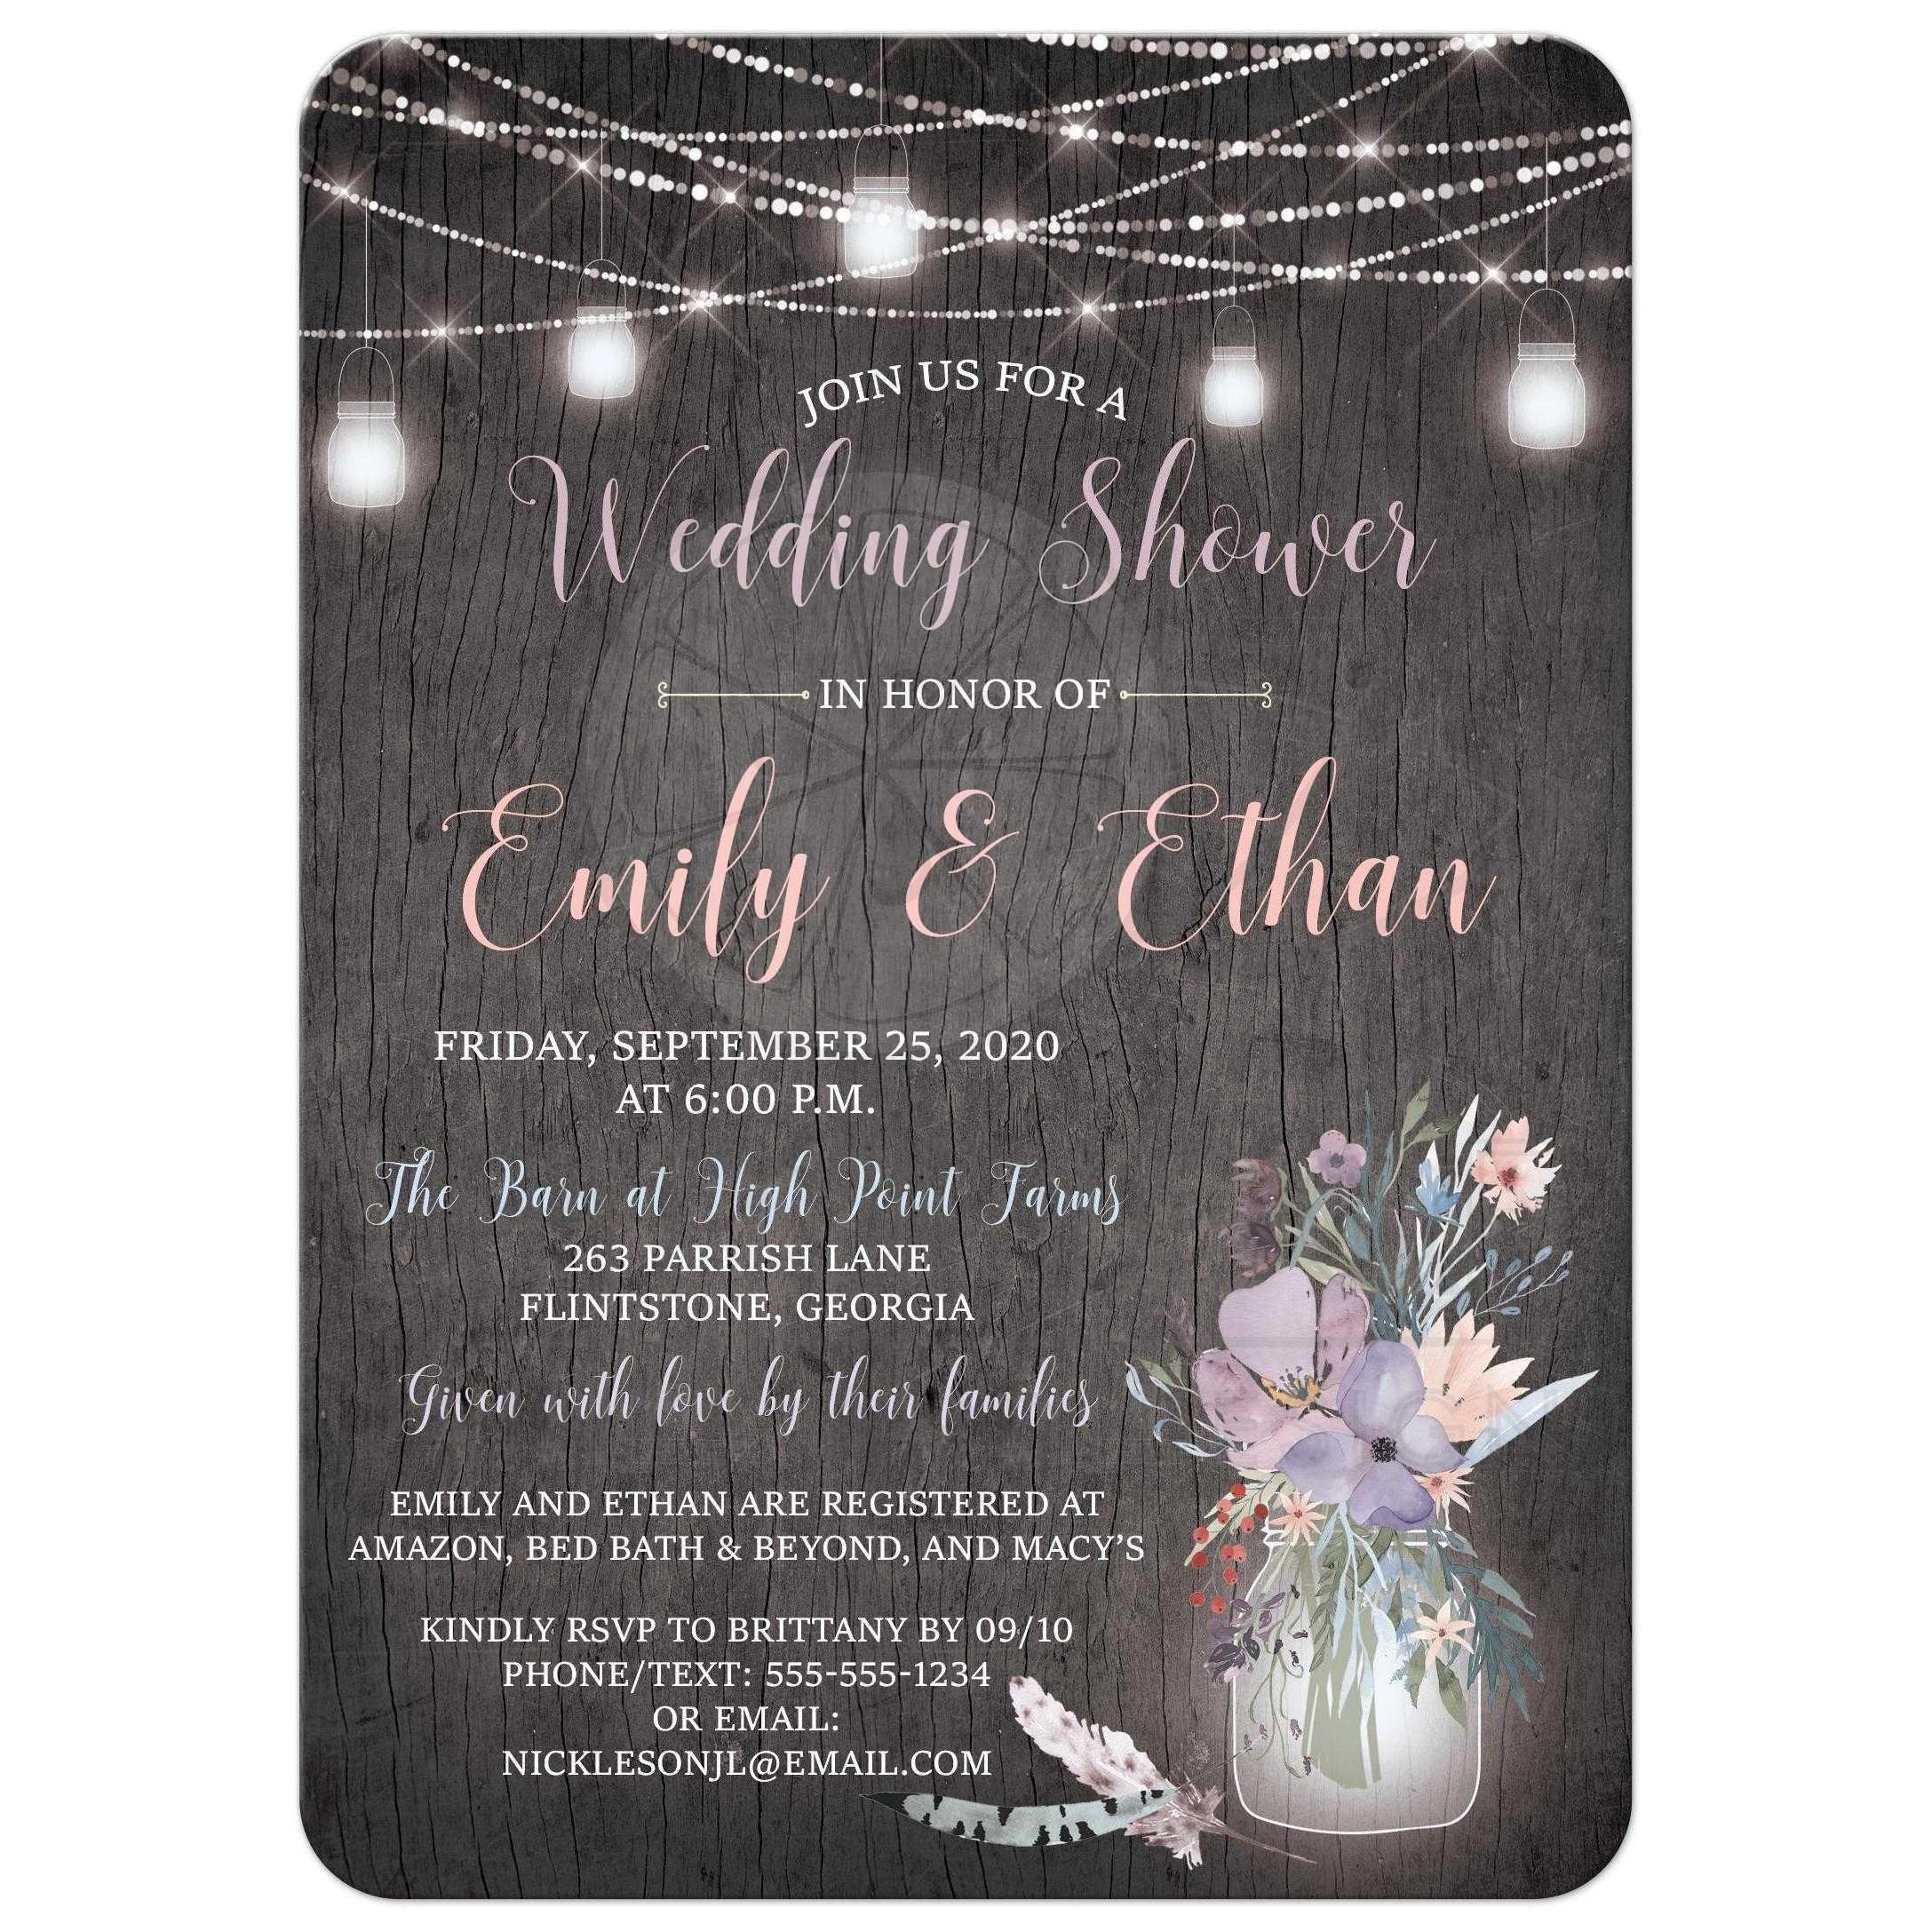 Rustic Wedding Shower Invitation Gray Barn Wood With Mason Jars